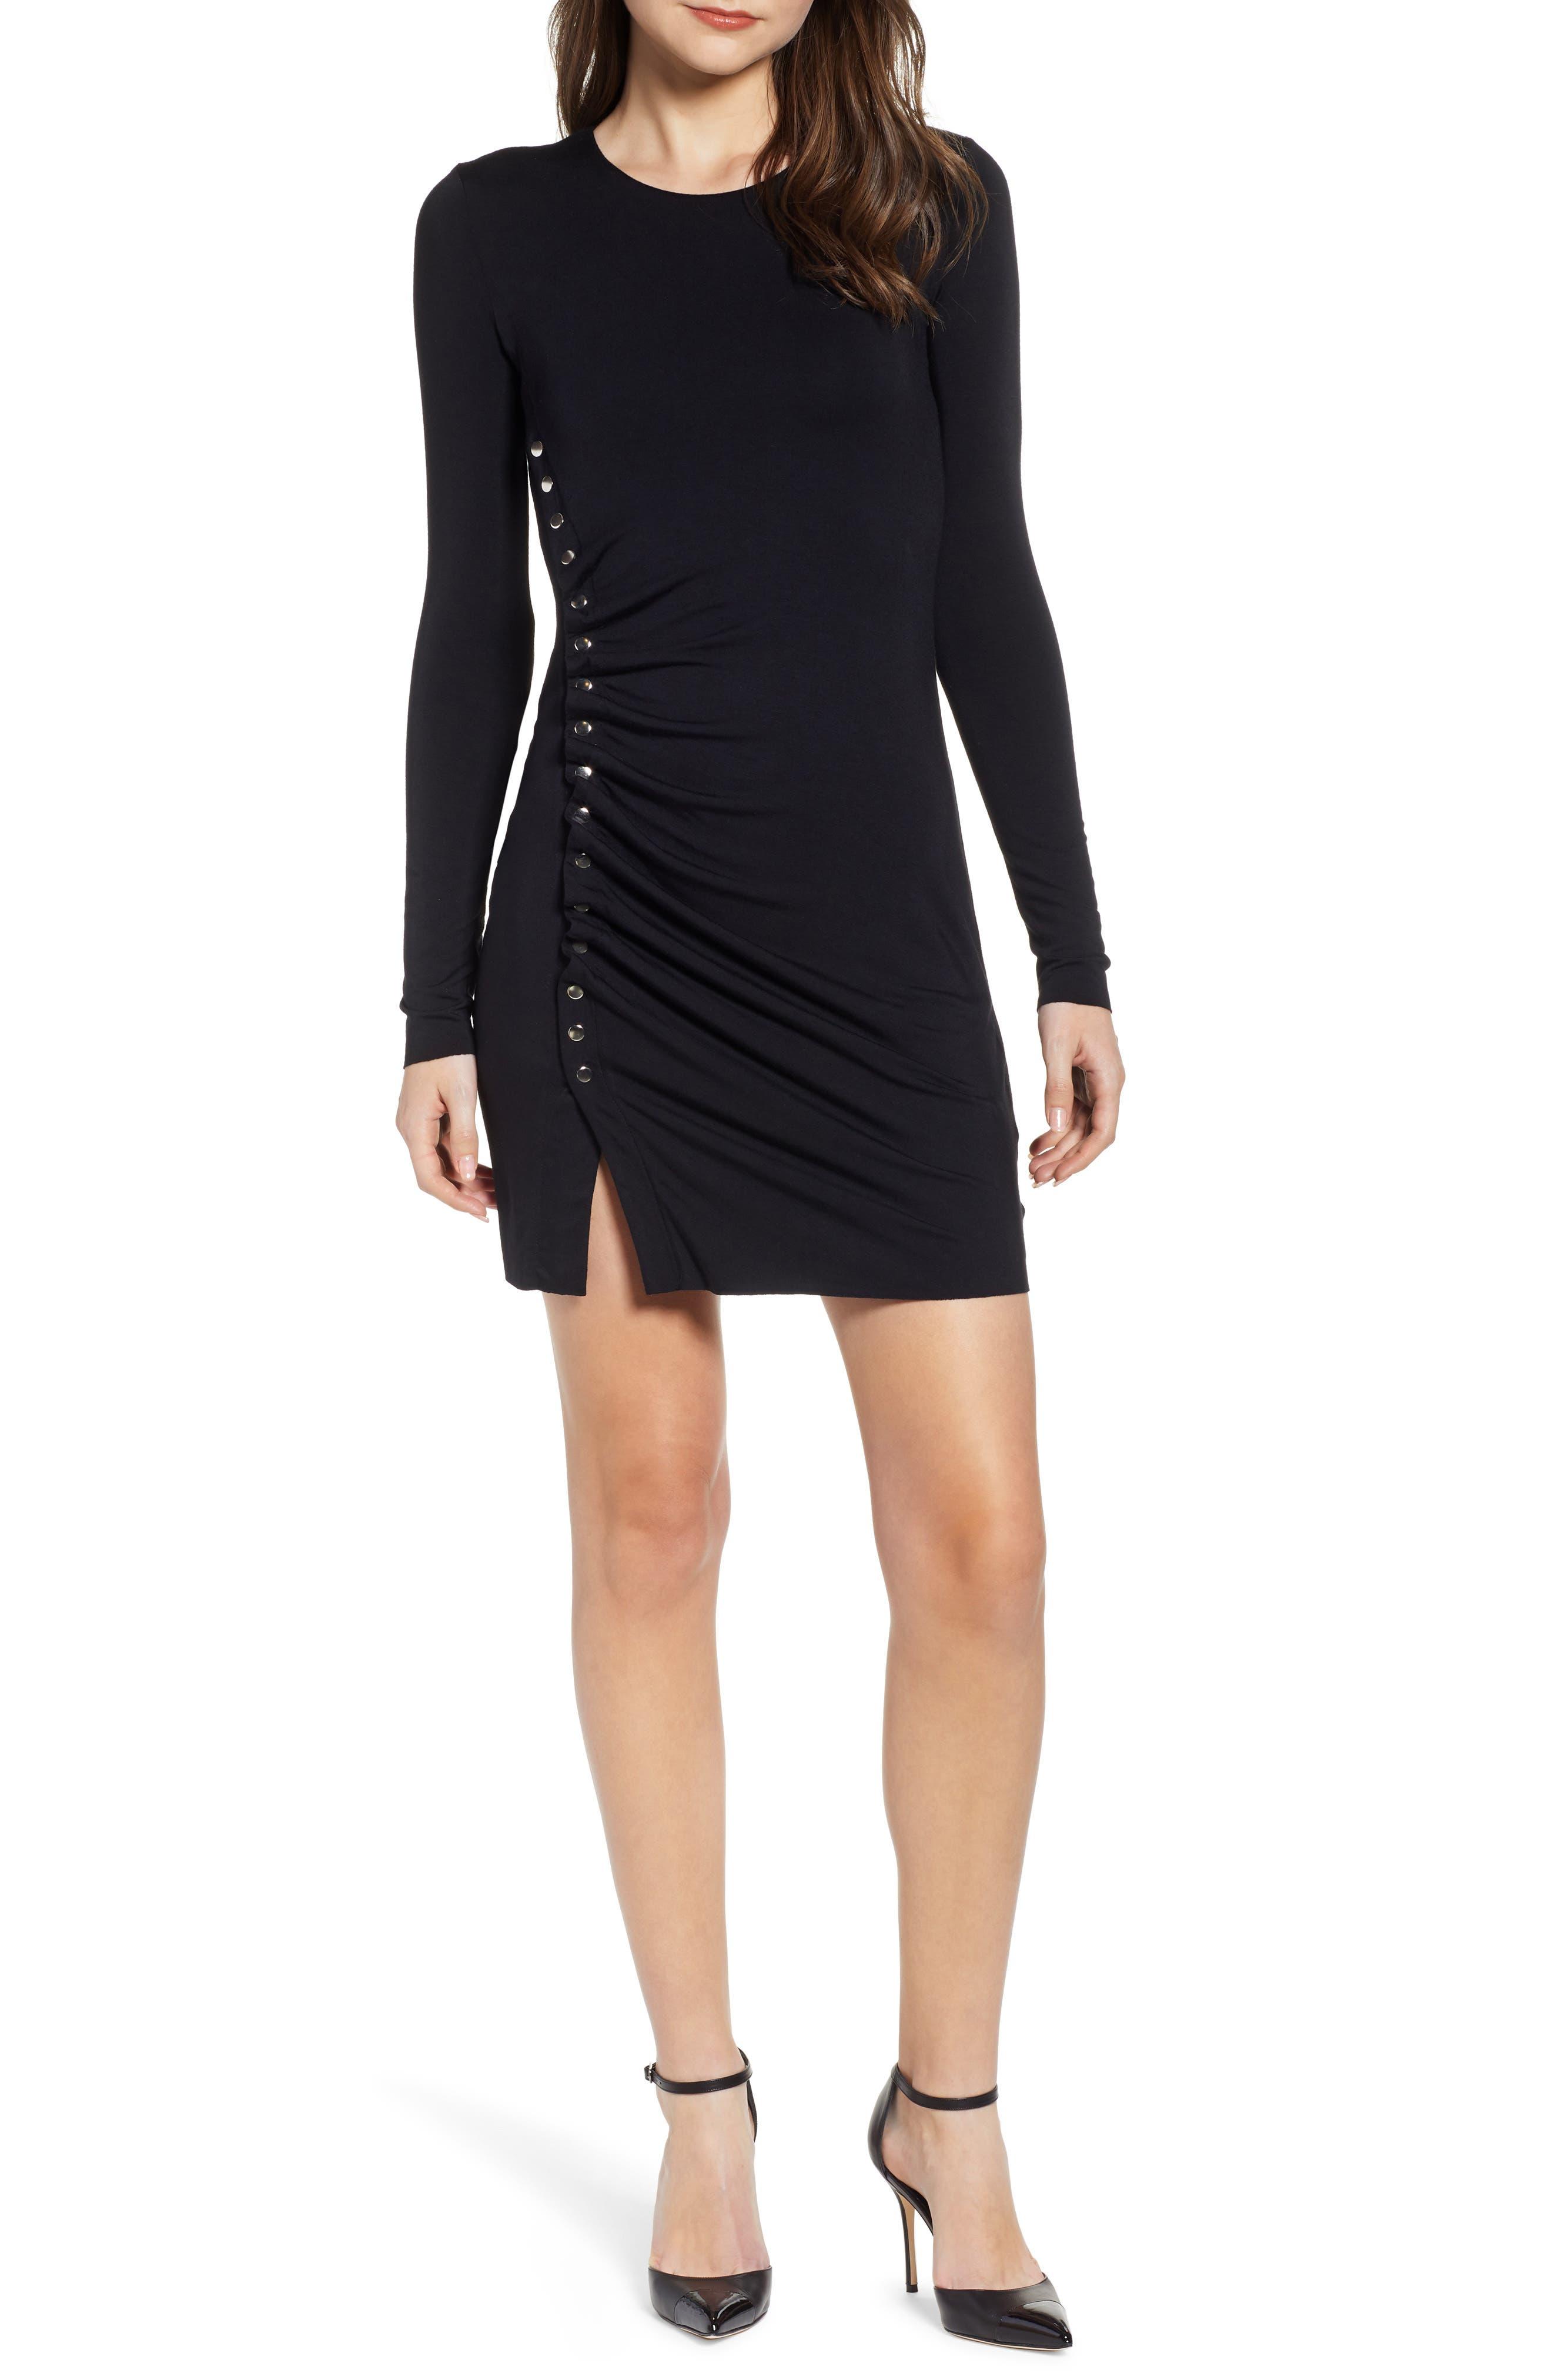 Bailey 44 Radiate Stud Detail Body-Con Dress, Black